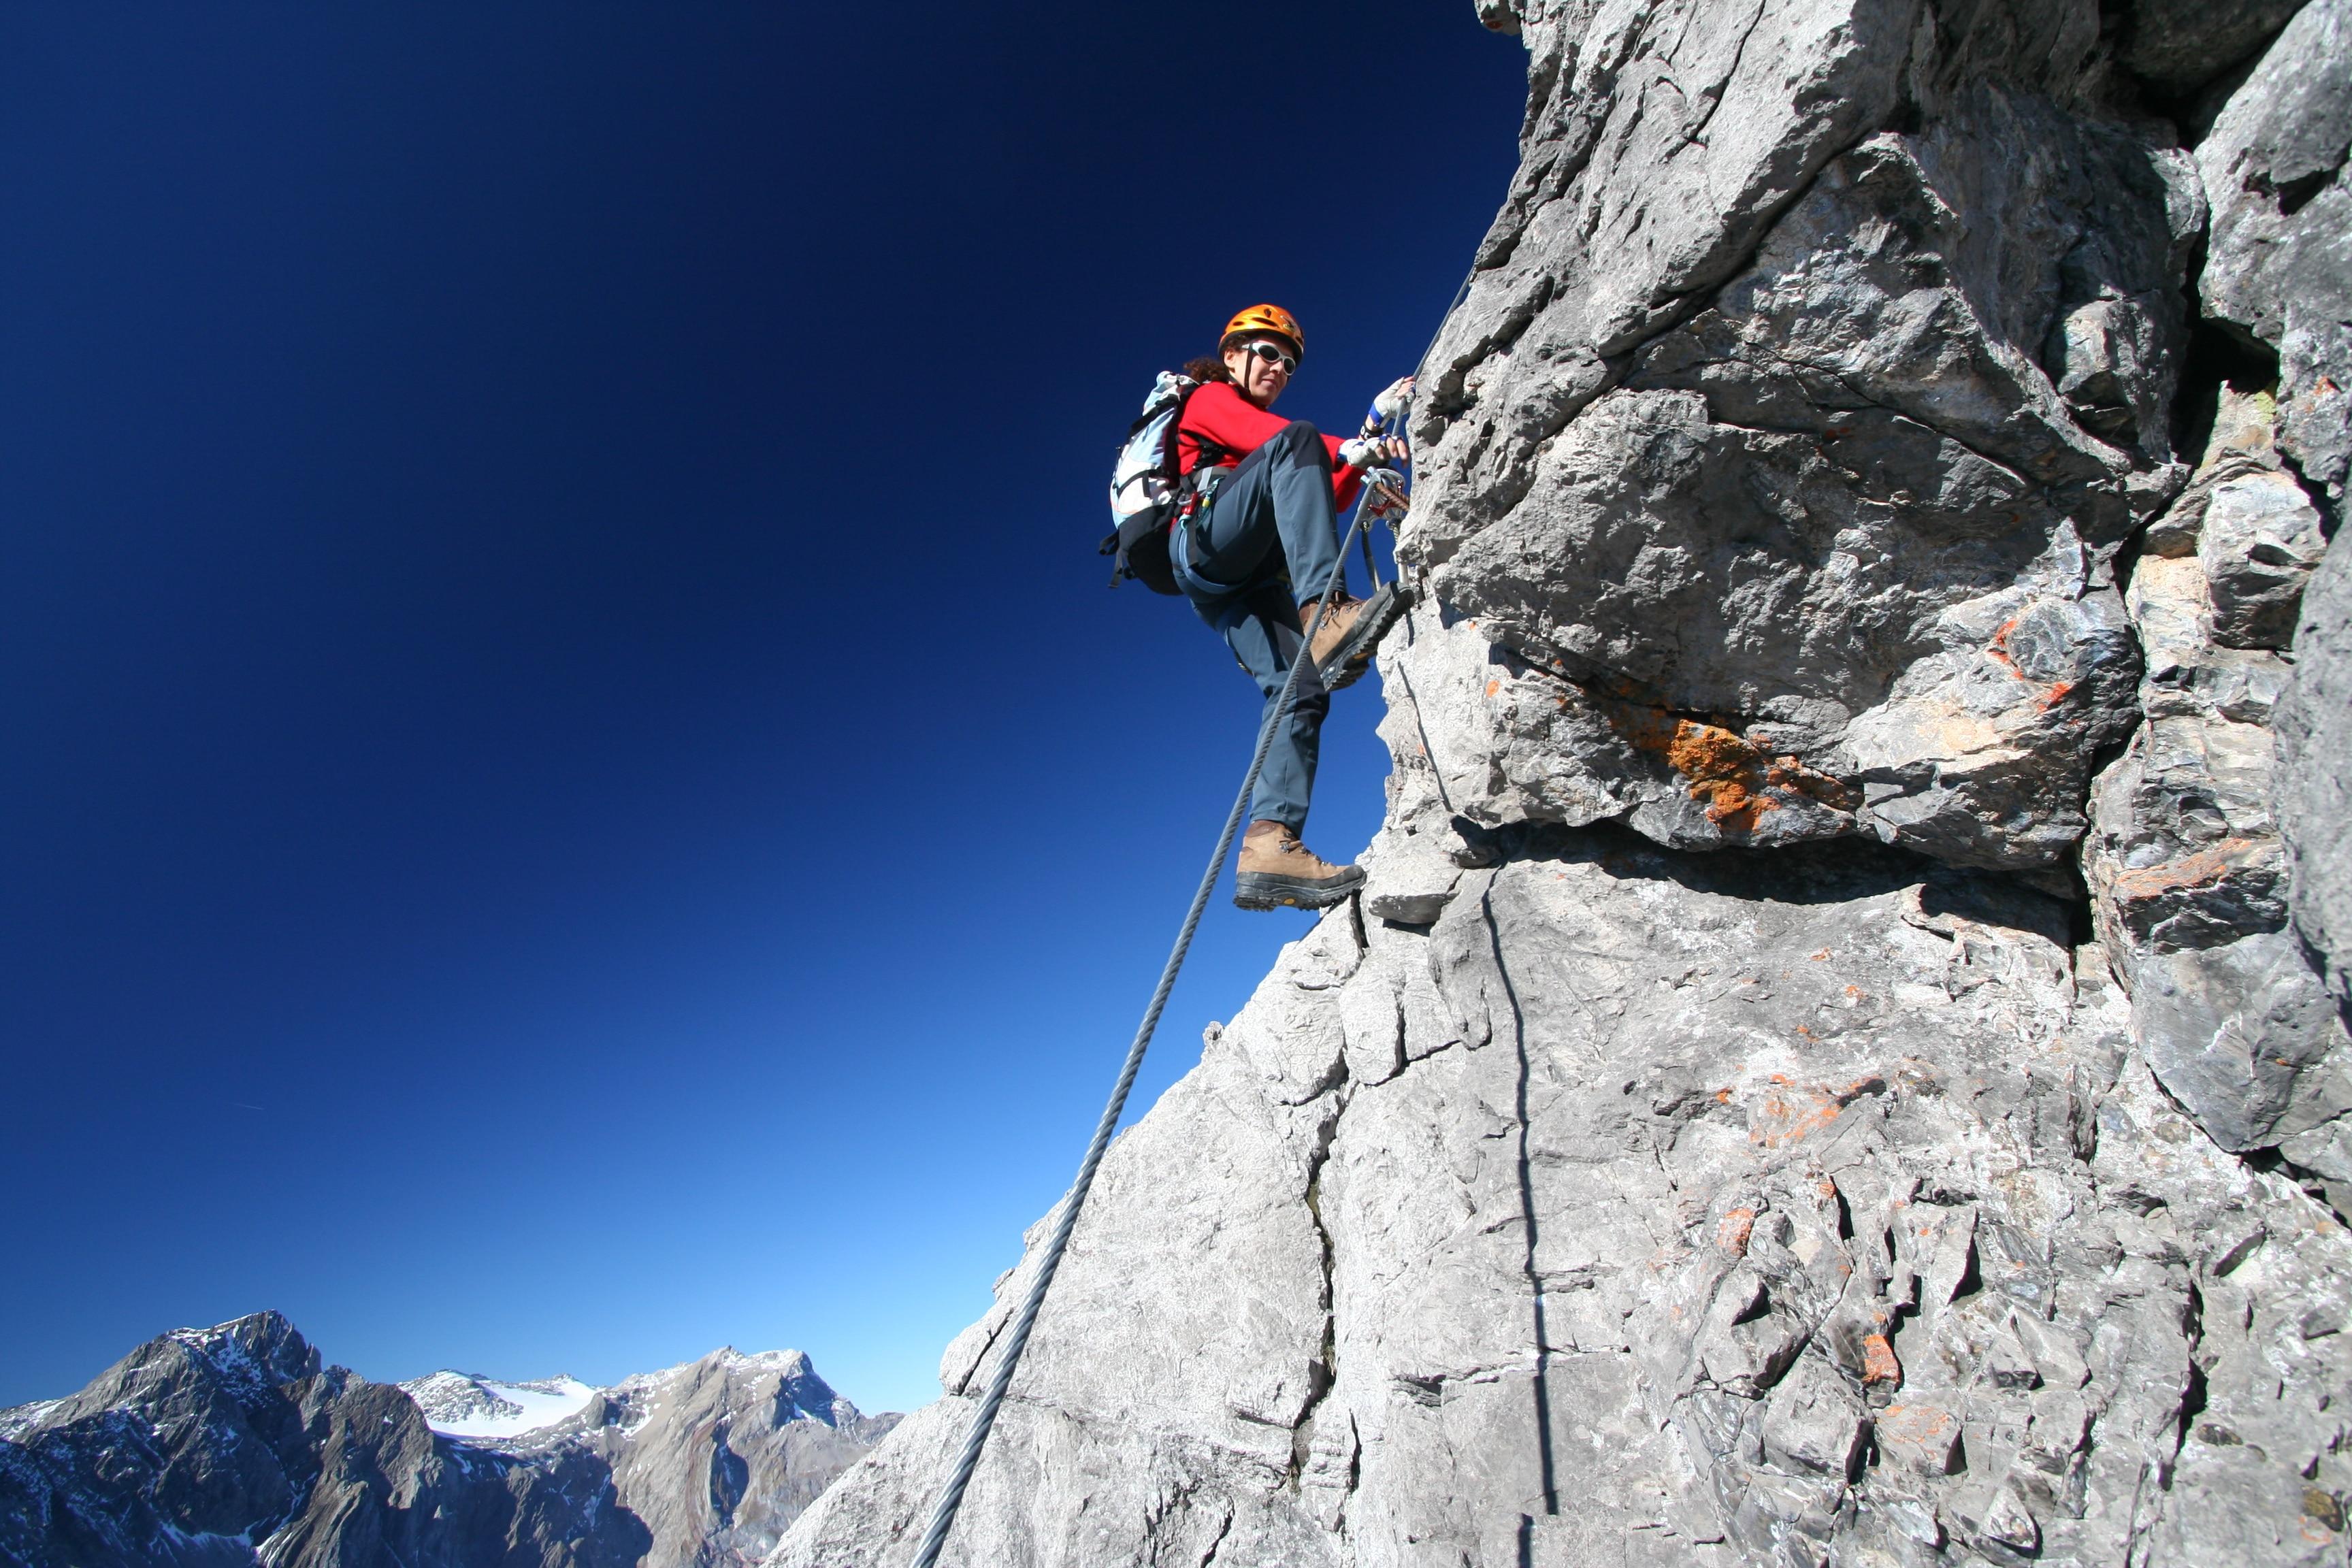 Klettersteig Saulakopf : Klettersteige saula klettersteig km bergwelten